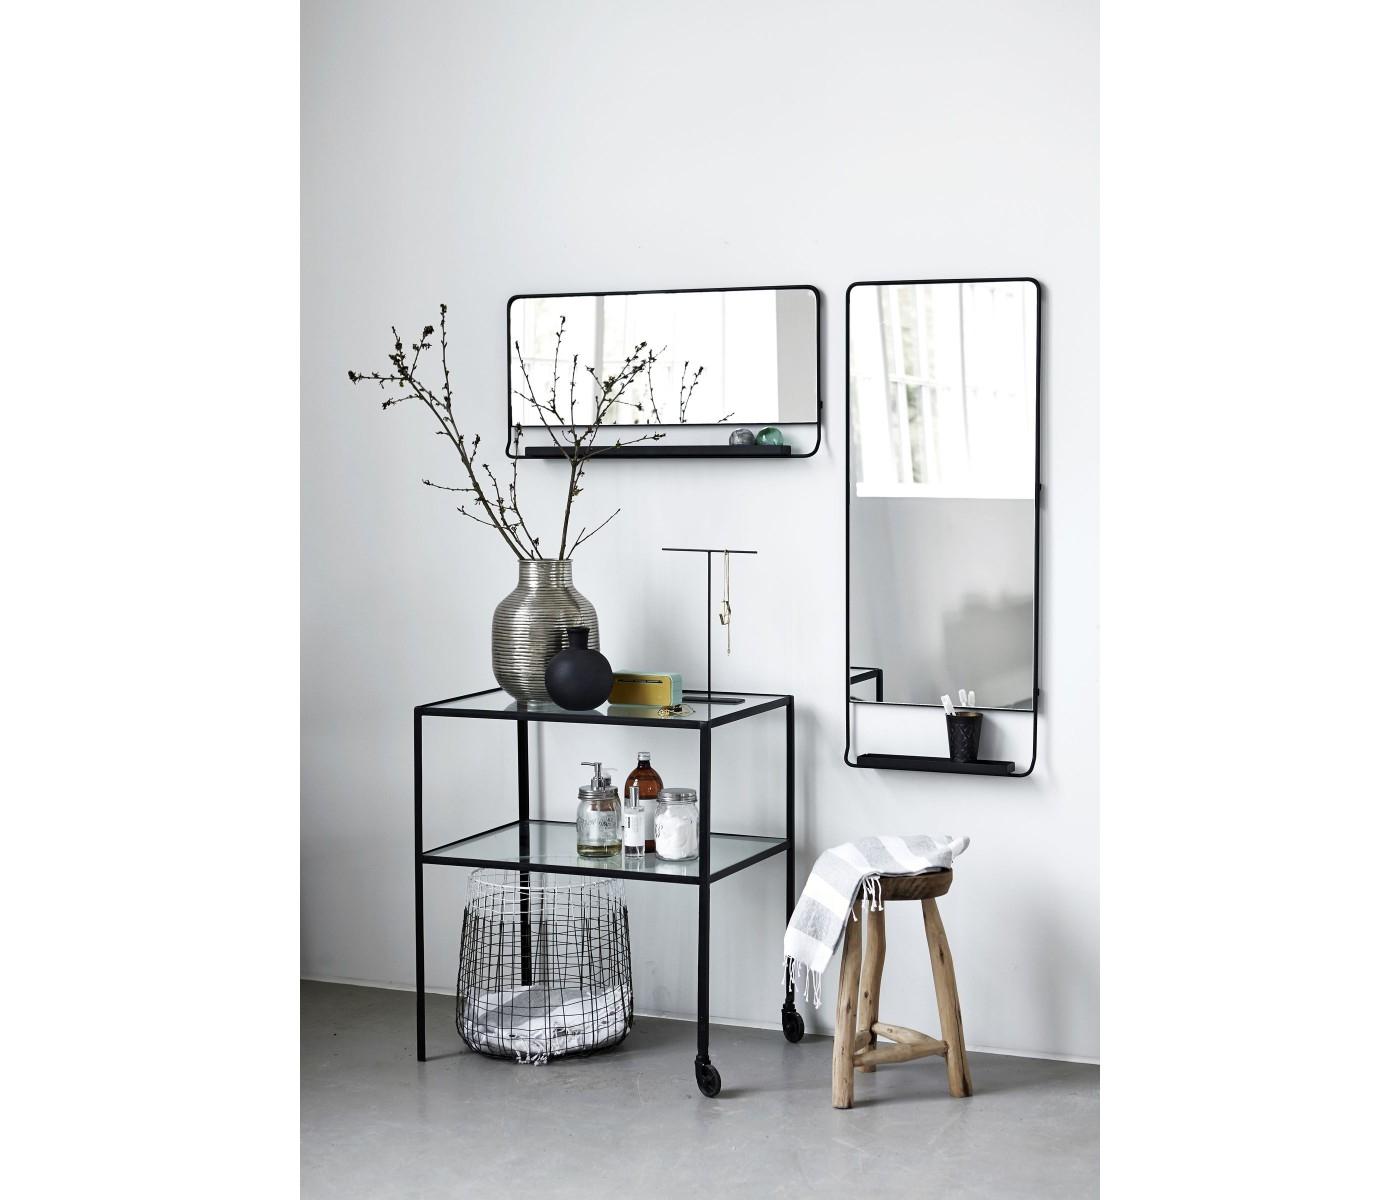 Black Horizontal Wall Mirror Black Horizontal Wall Mirror horizontal wall mirror chic with shelfe and black edge house doctor 1400 X 1200